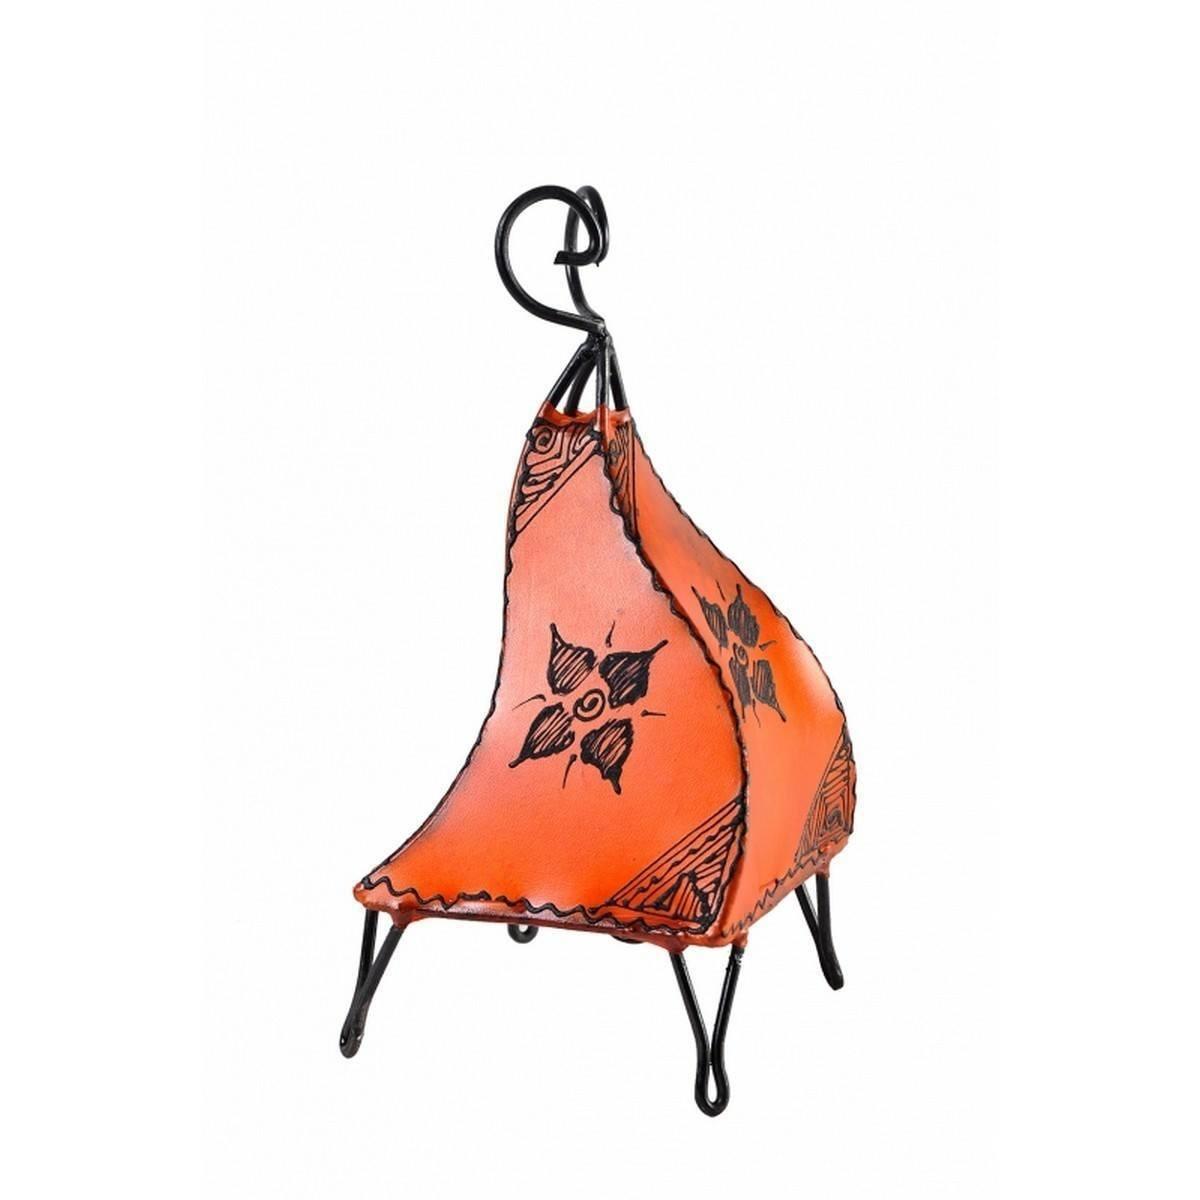 orientalische marokkanische stehlampe leder lampe hennalampe lederleuchte melaho ebay. Black Bedroom Furniture Sets. Home Design Ideas